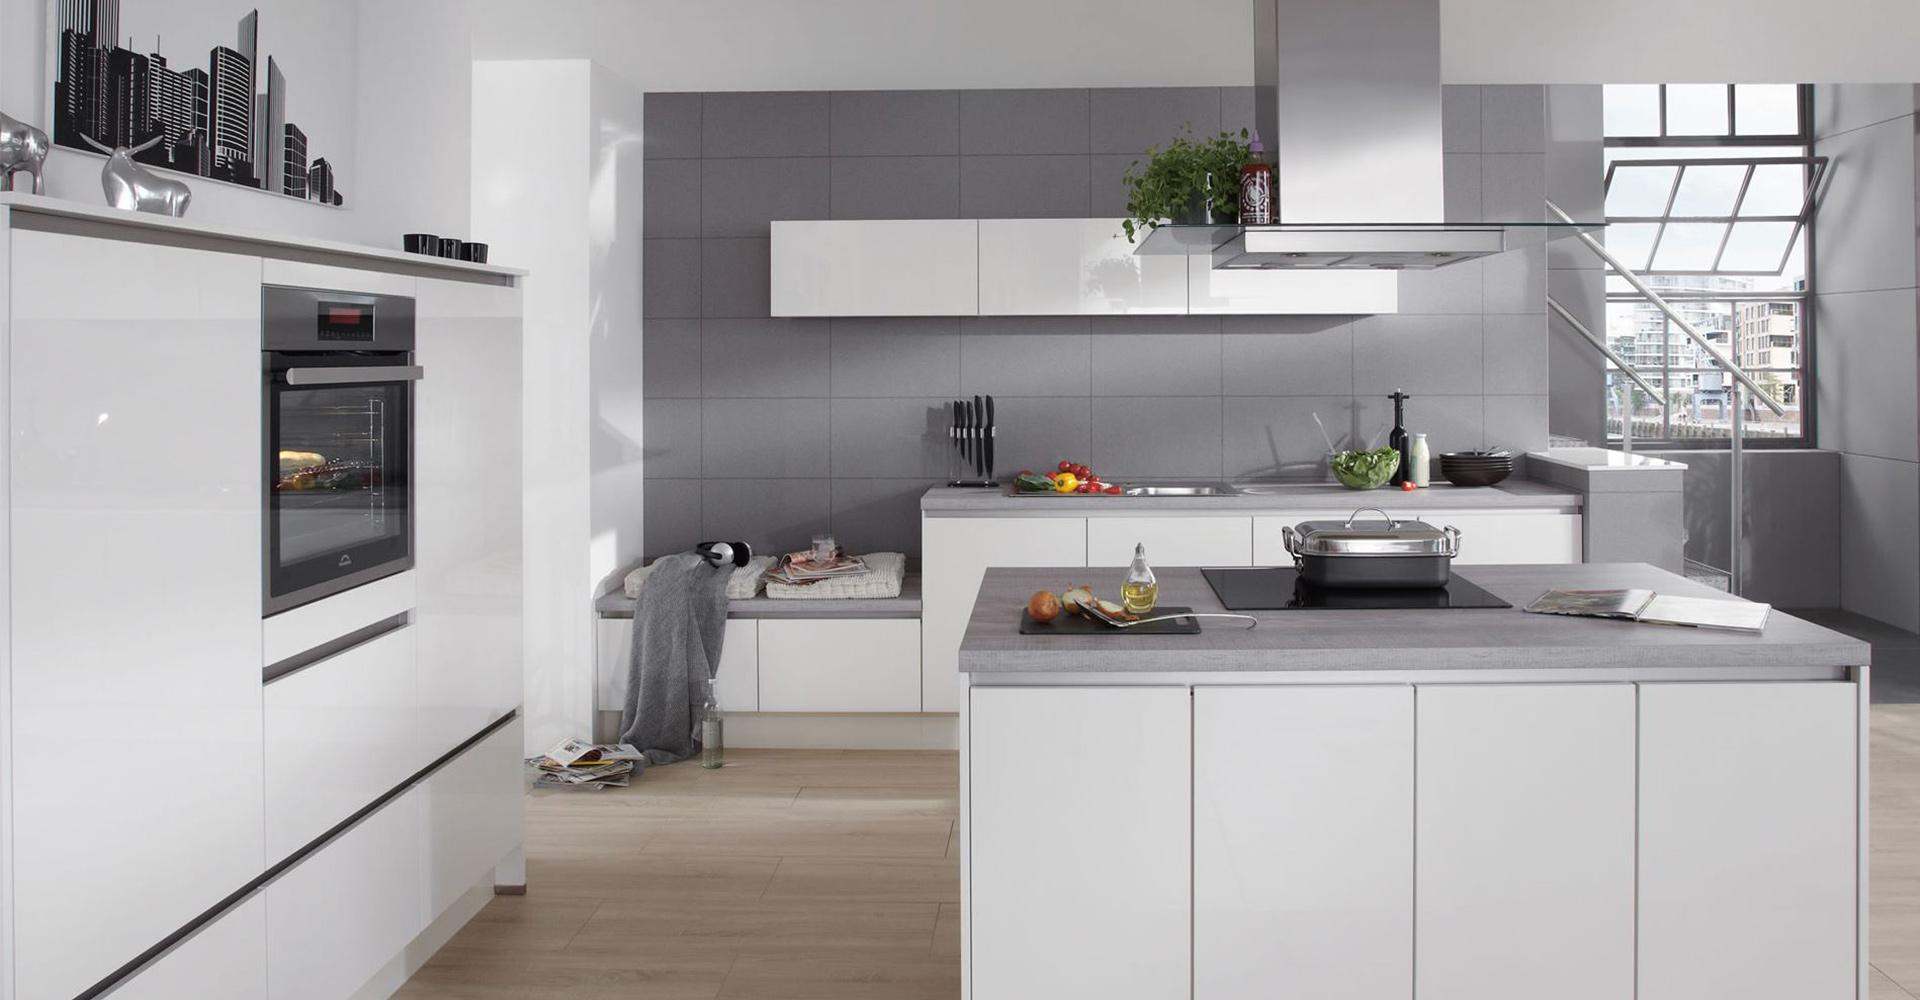 Greeploze keukens   modern en strak   otten keukens & sanitair